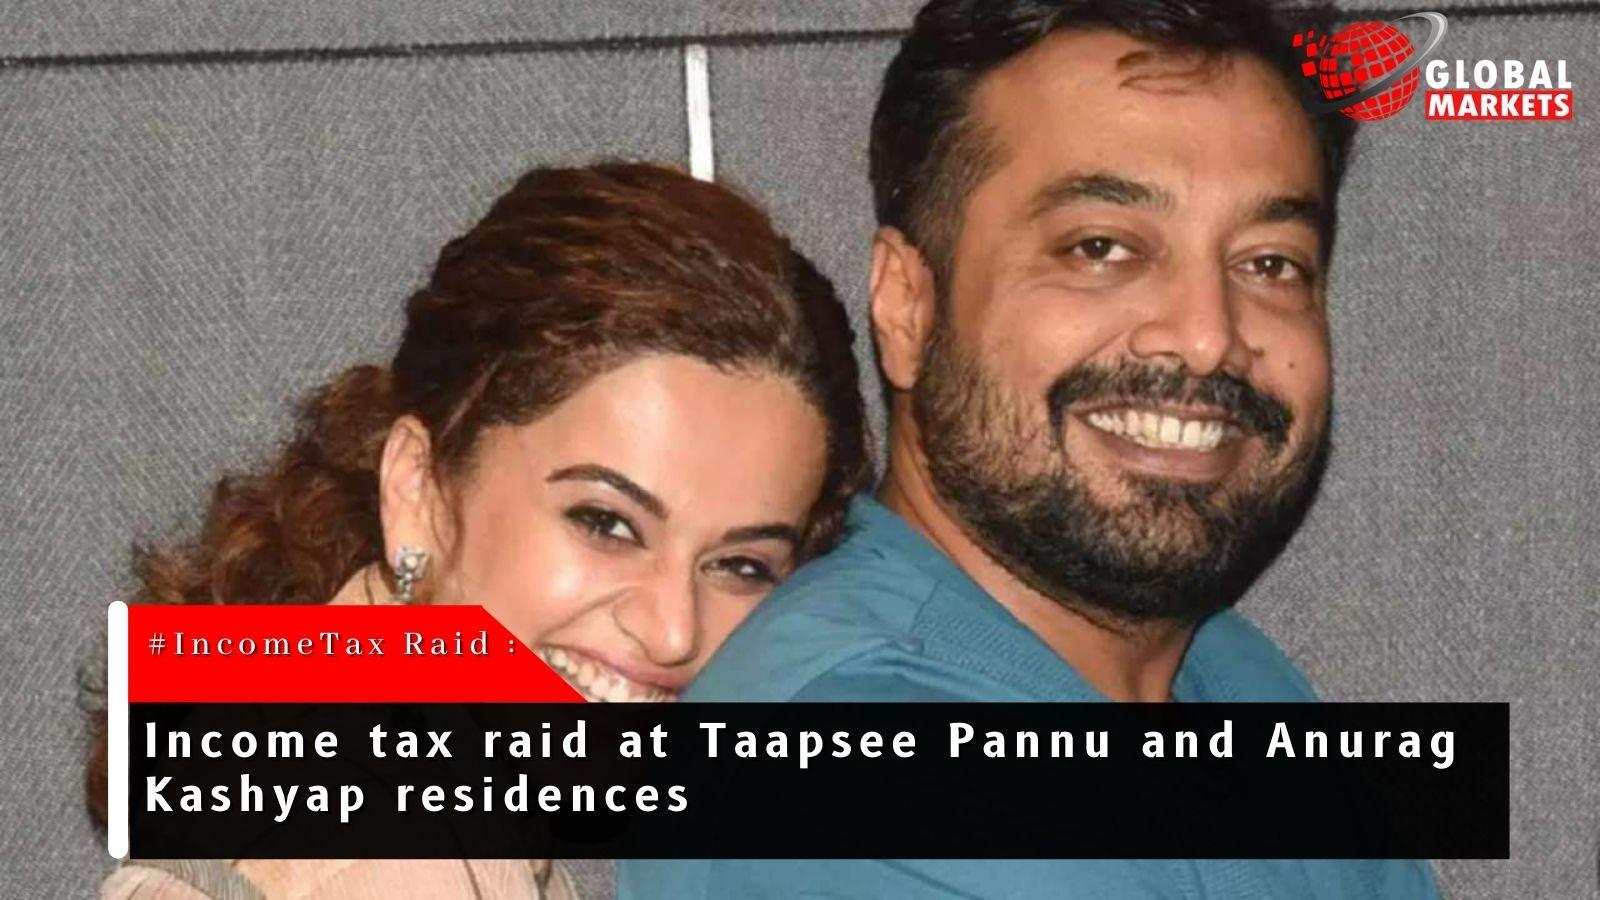 Film director Anurag Kashyap, Actress Taapsee Pannu Face Income Tax Raids.